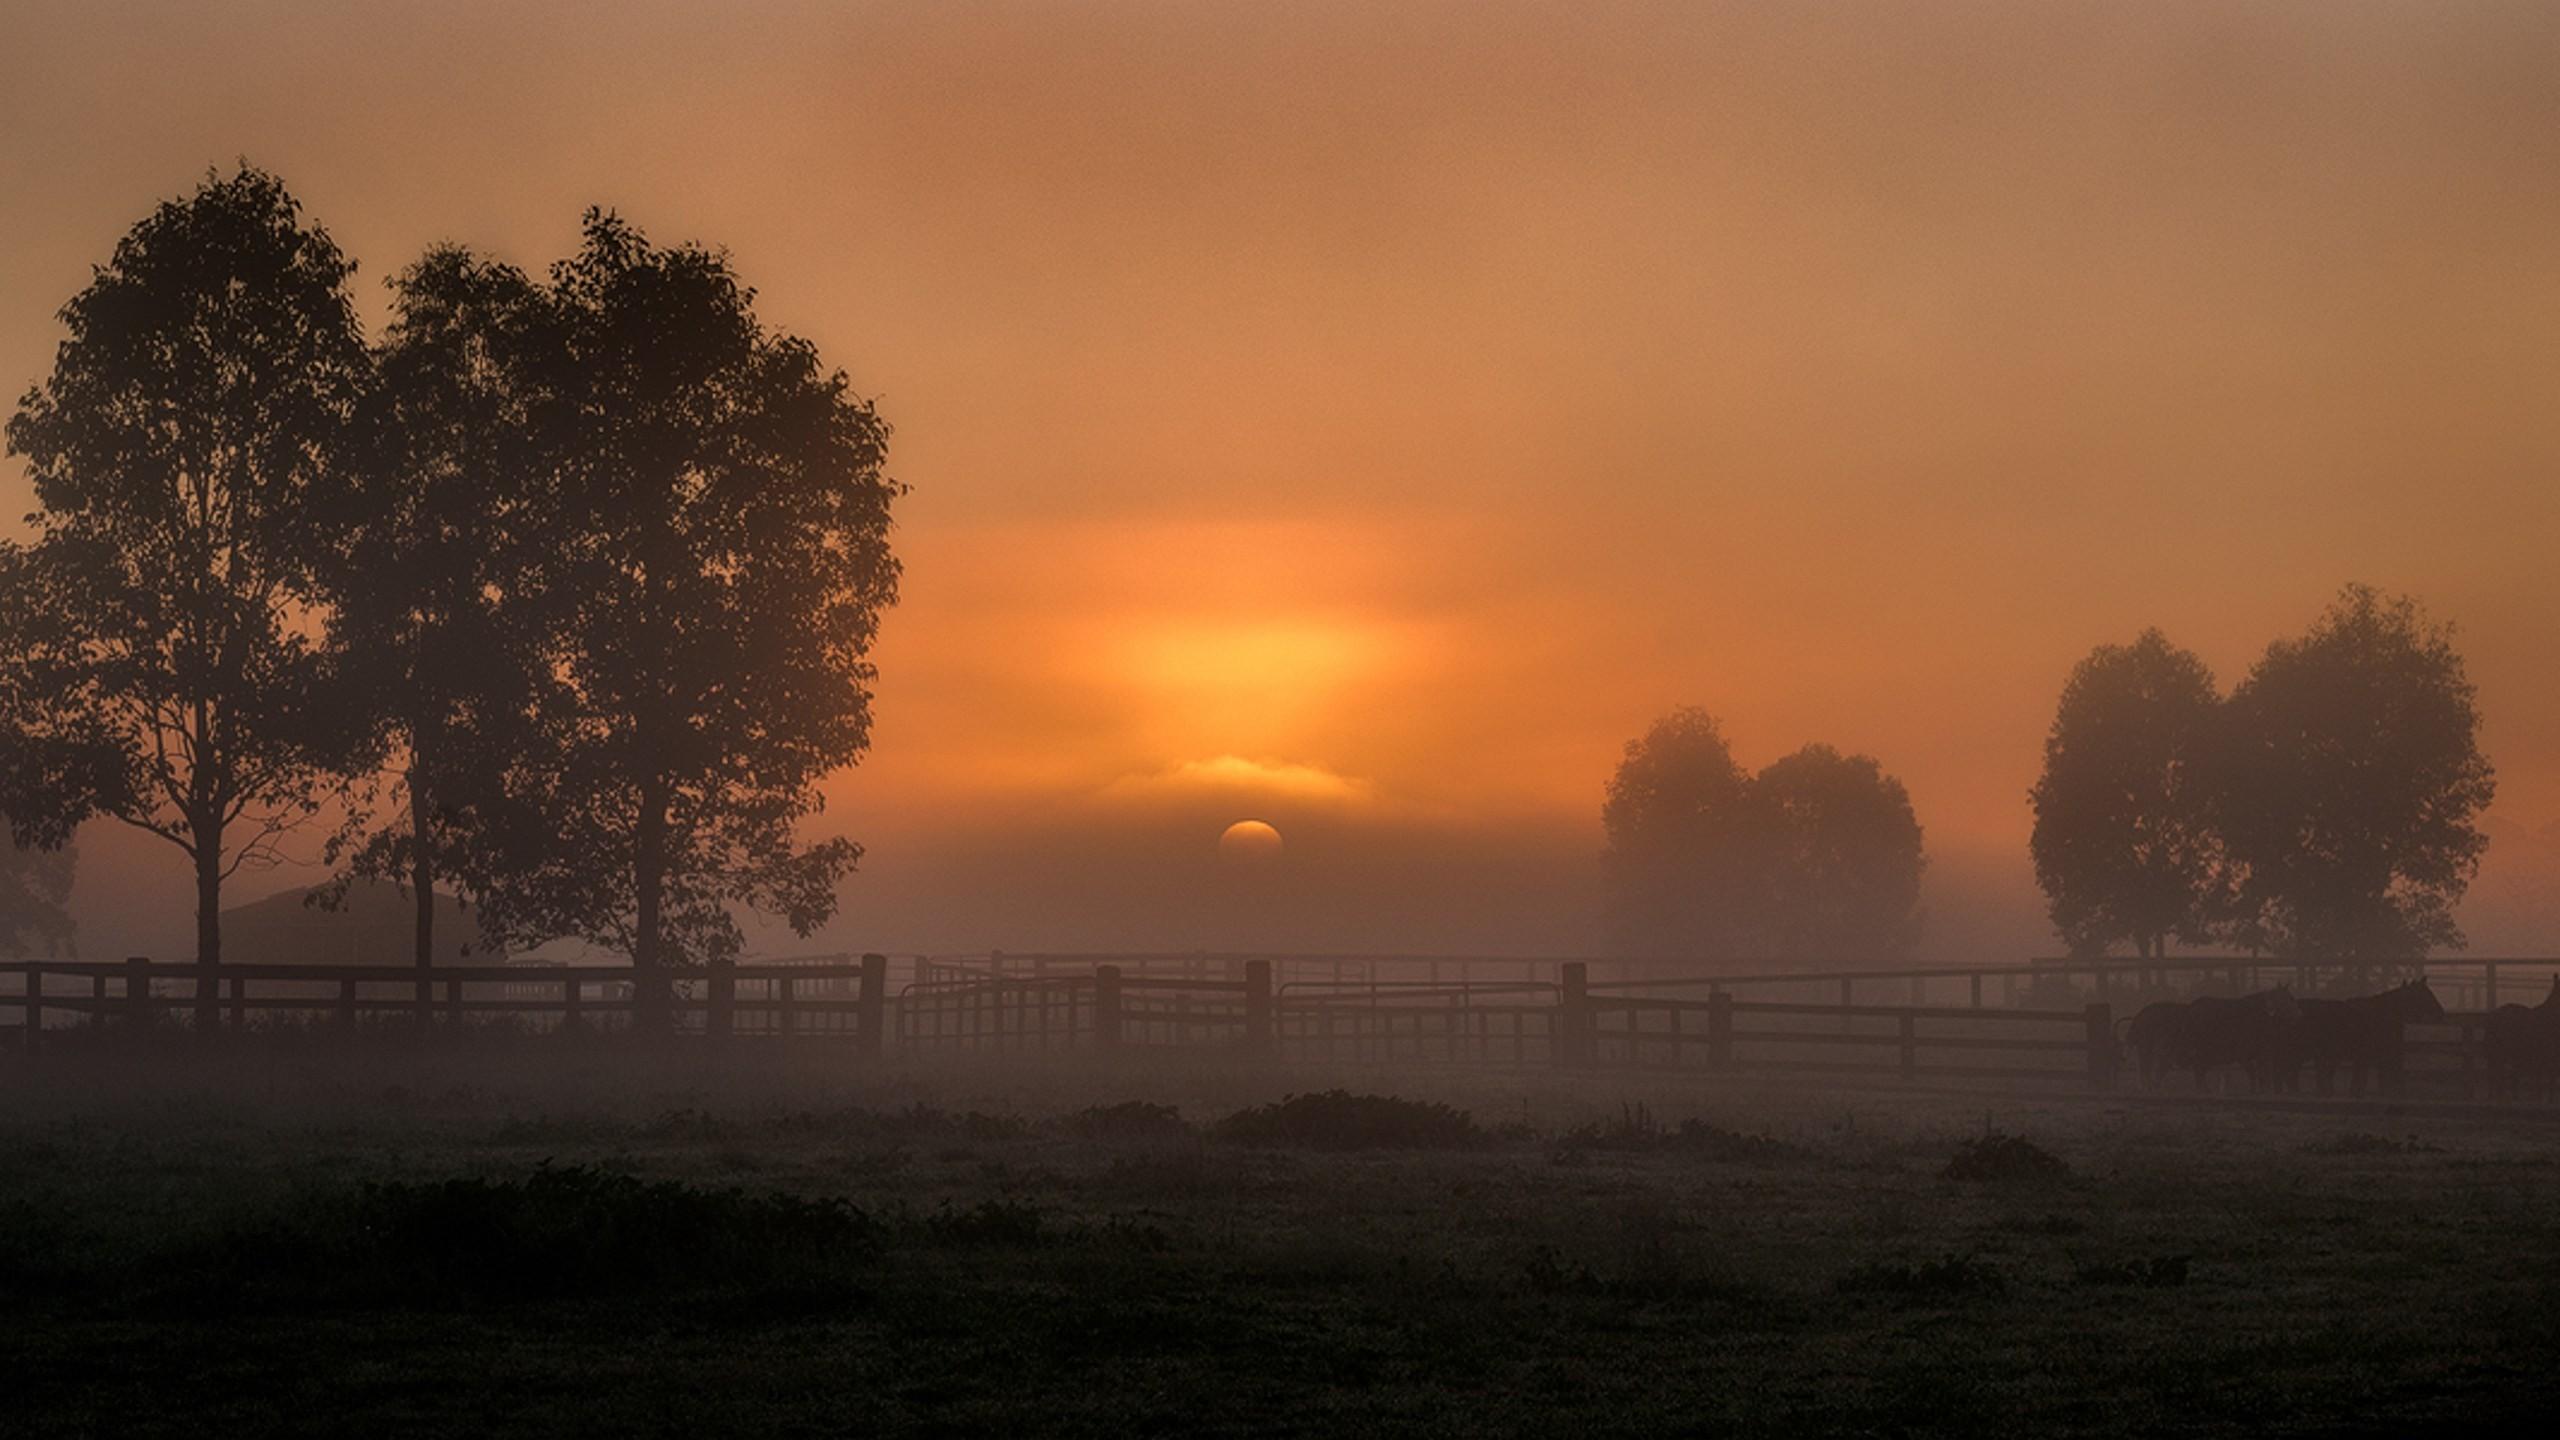 sunrise background images 183�� wallpapertag